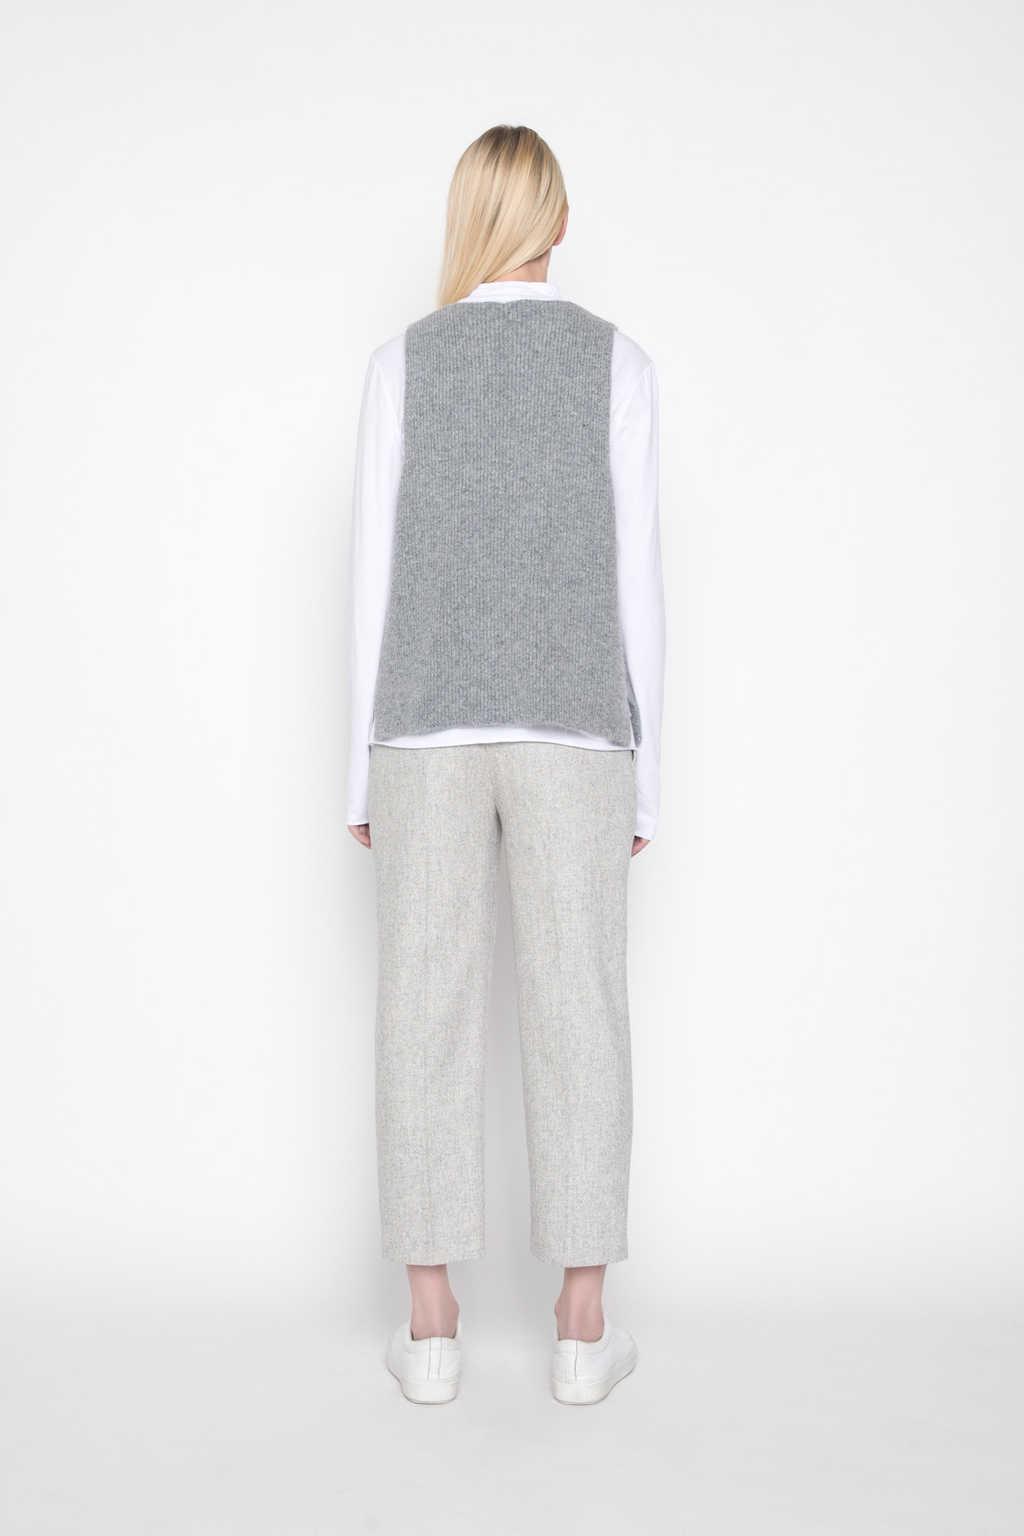 Vest G26 Gray 3